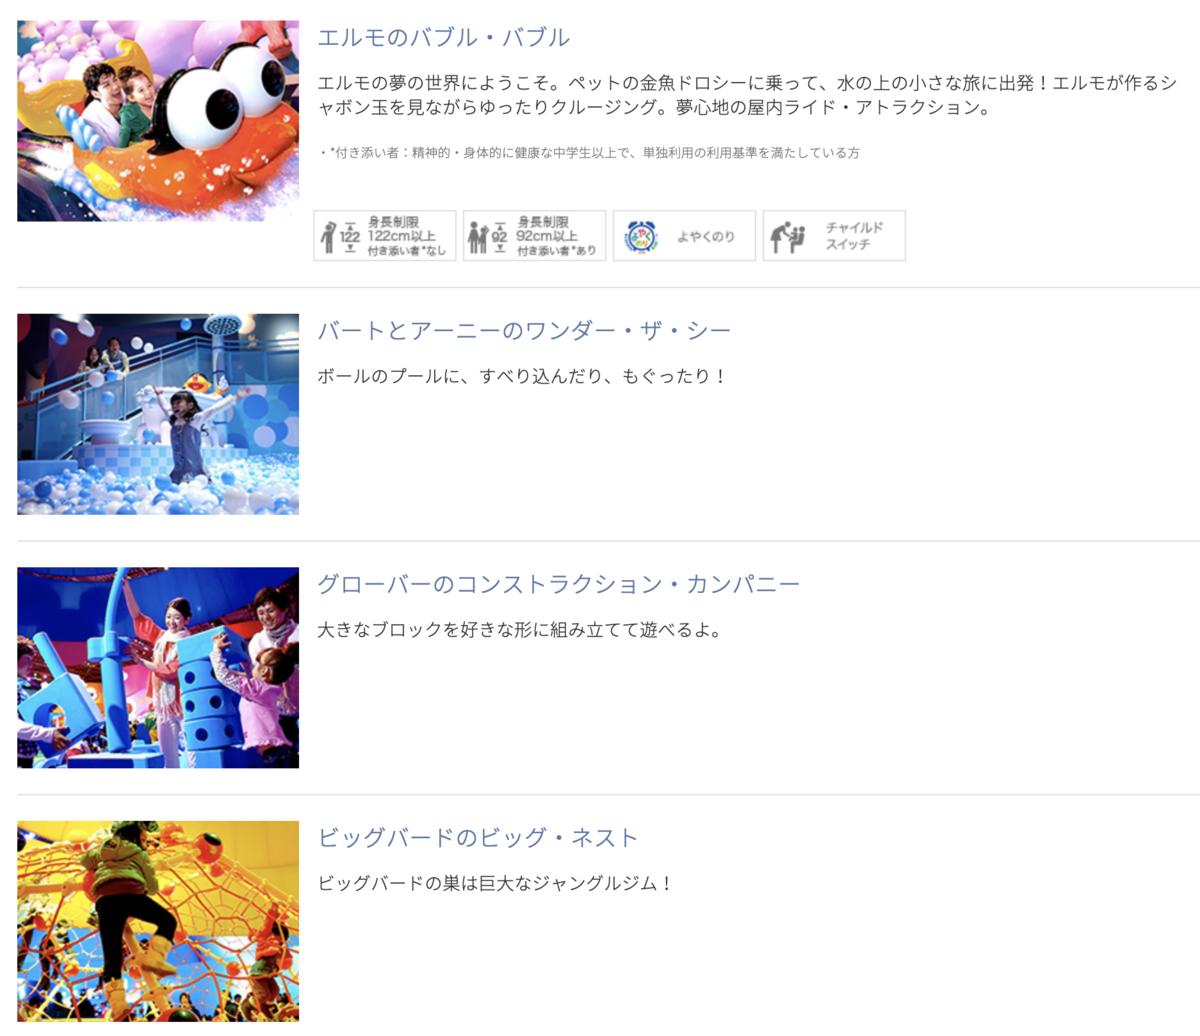 f:id:shingo-sakuragi:20200623011323p:plain